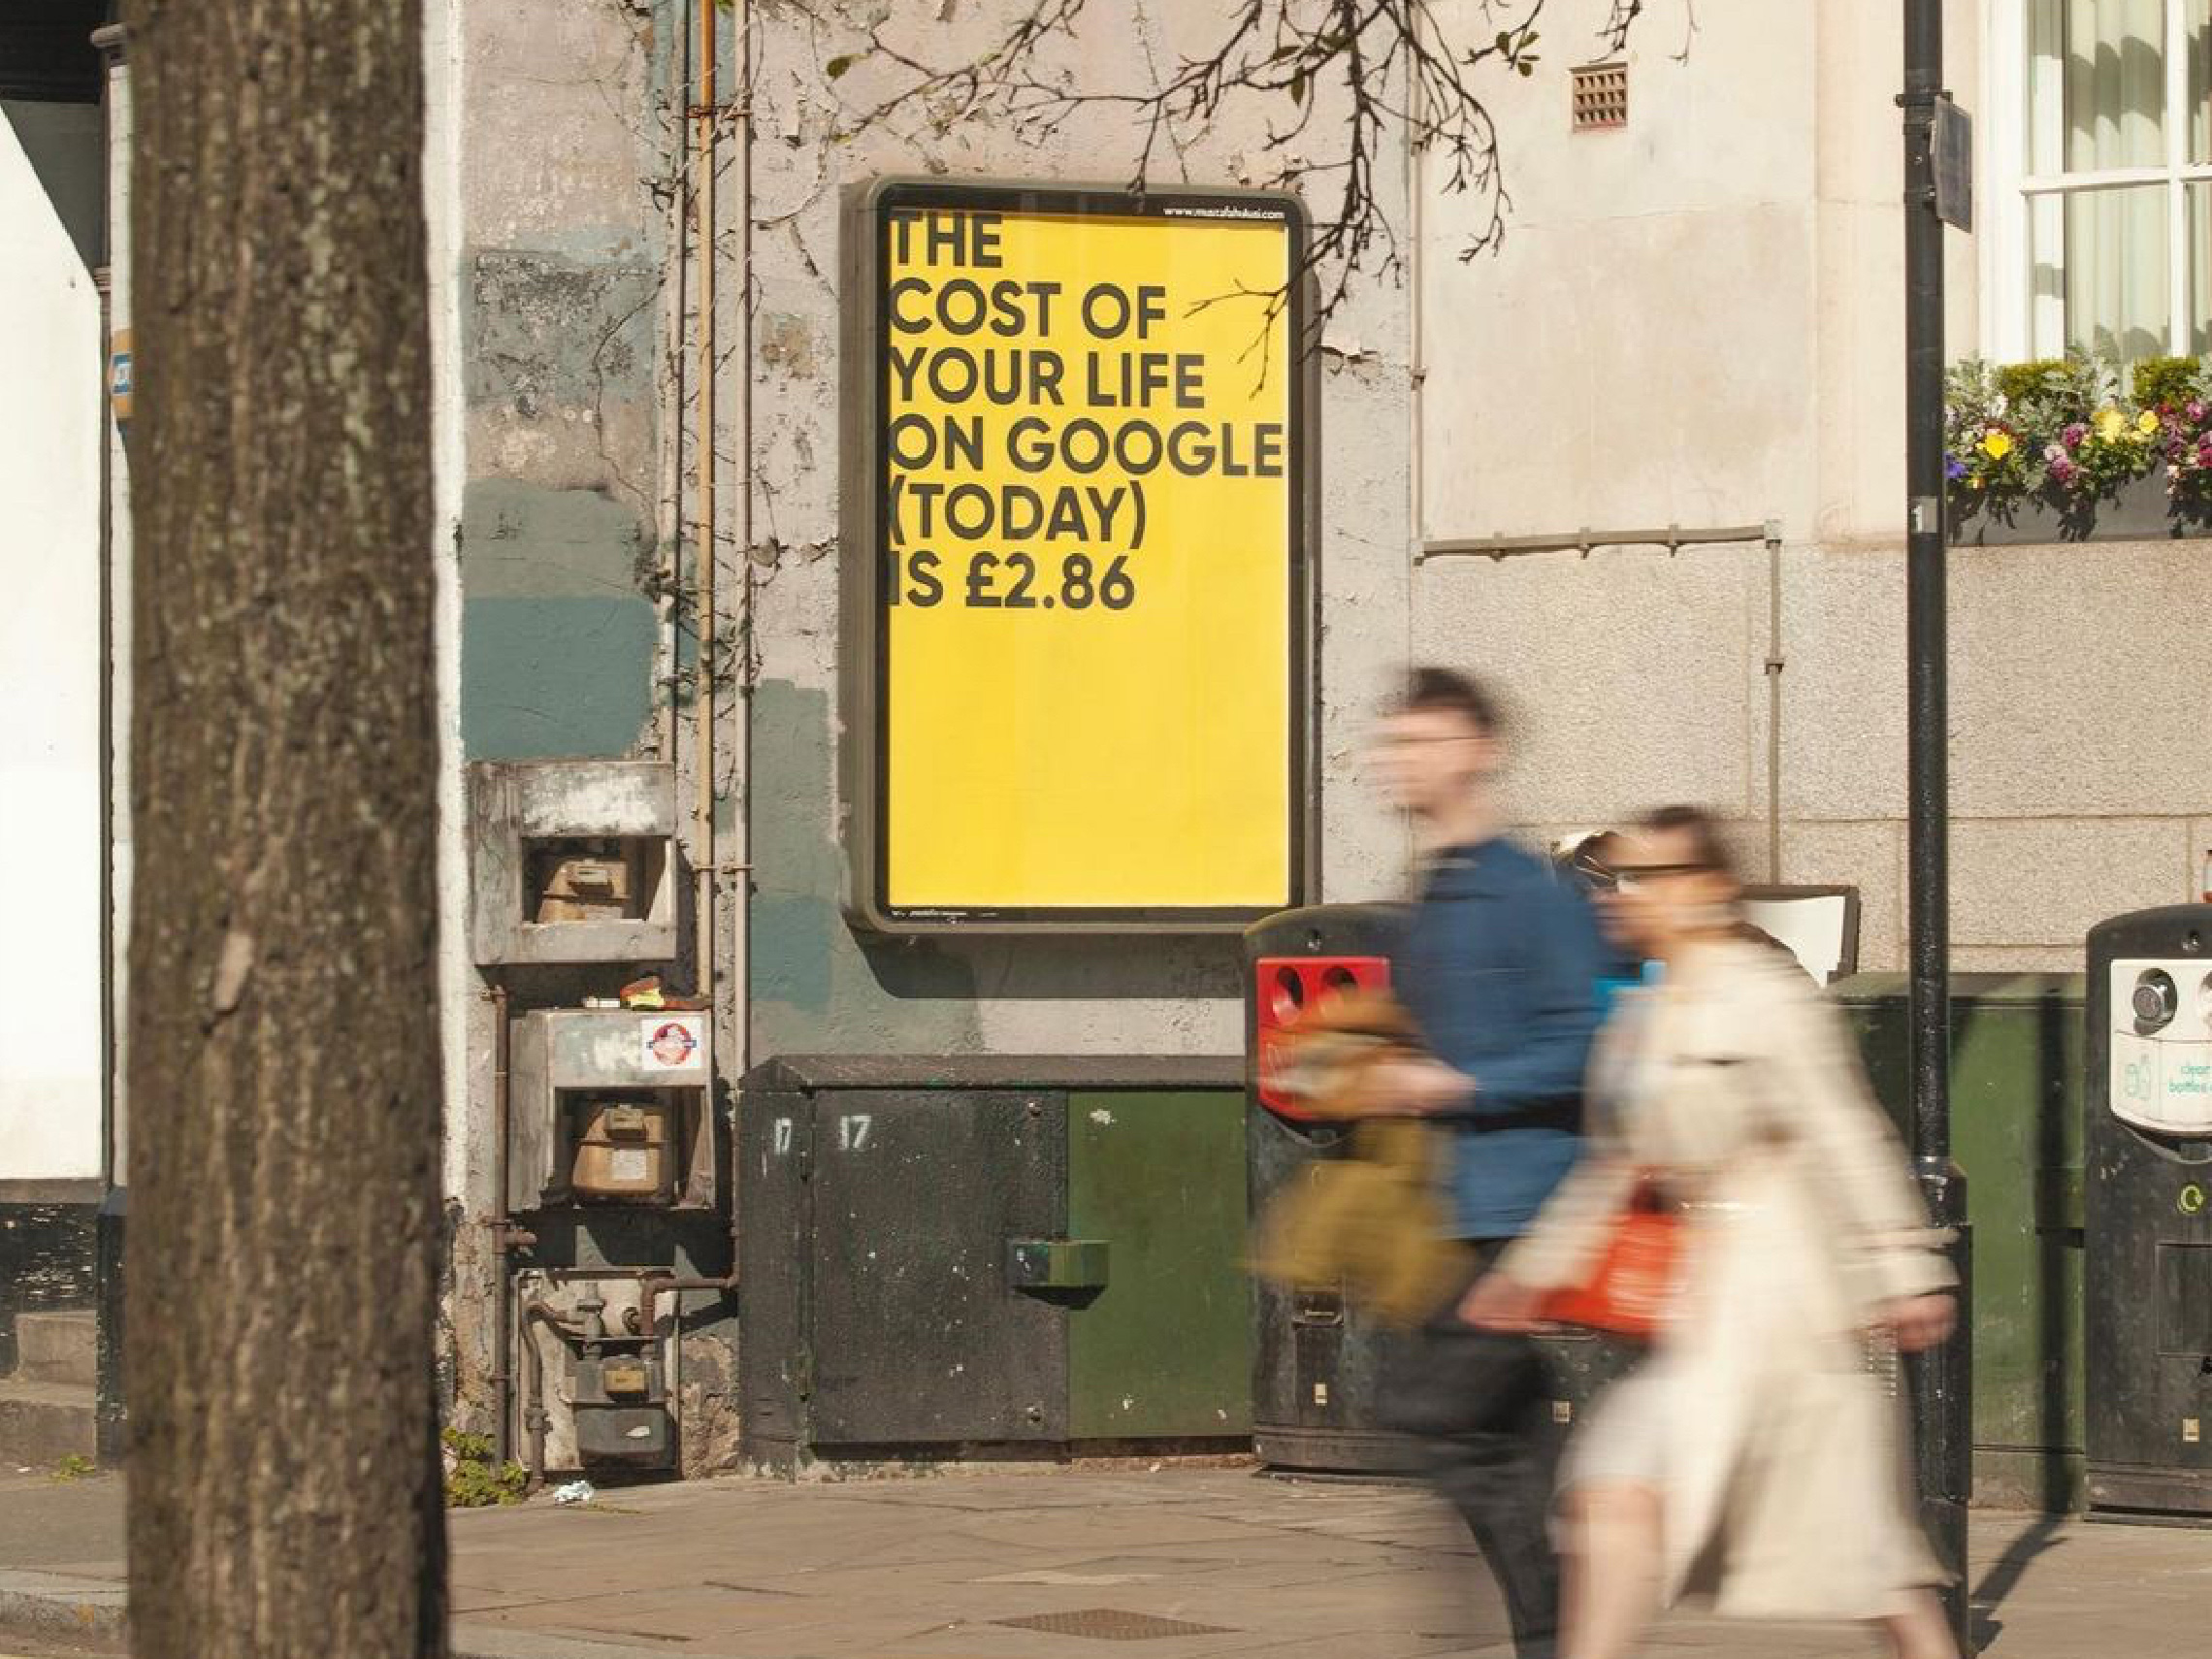 The Cost of Your Life on Google, by Fabio Lattanzi Antinori. Curated by Mustafa Hulusi. Old Street, London 2021;